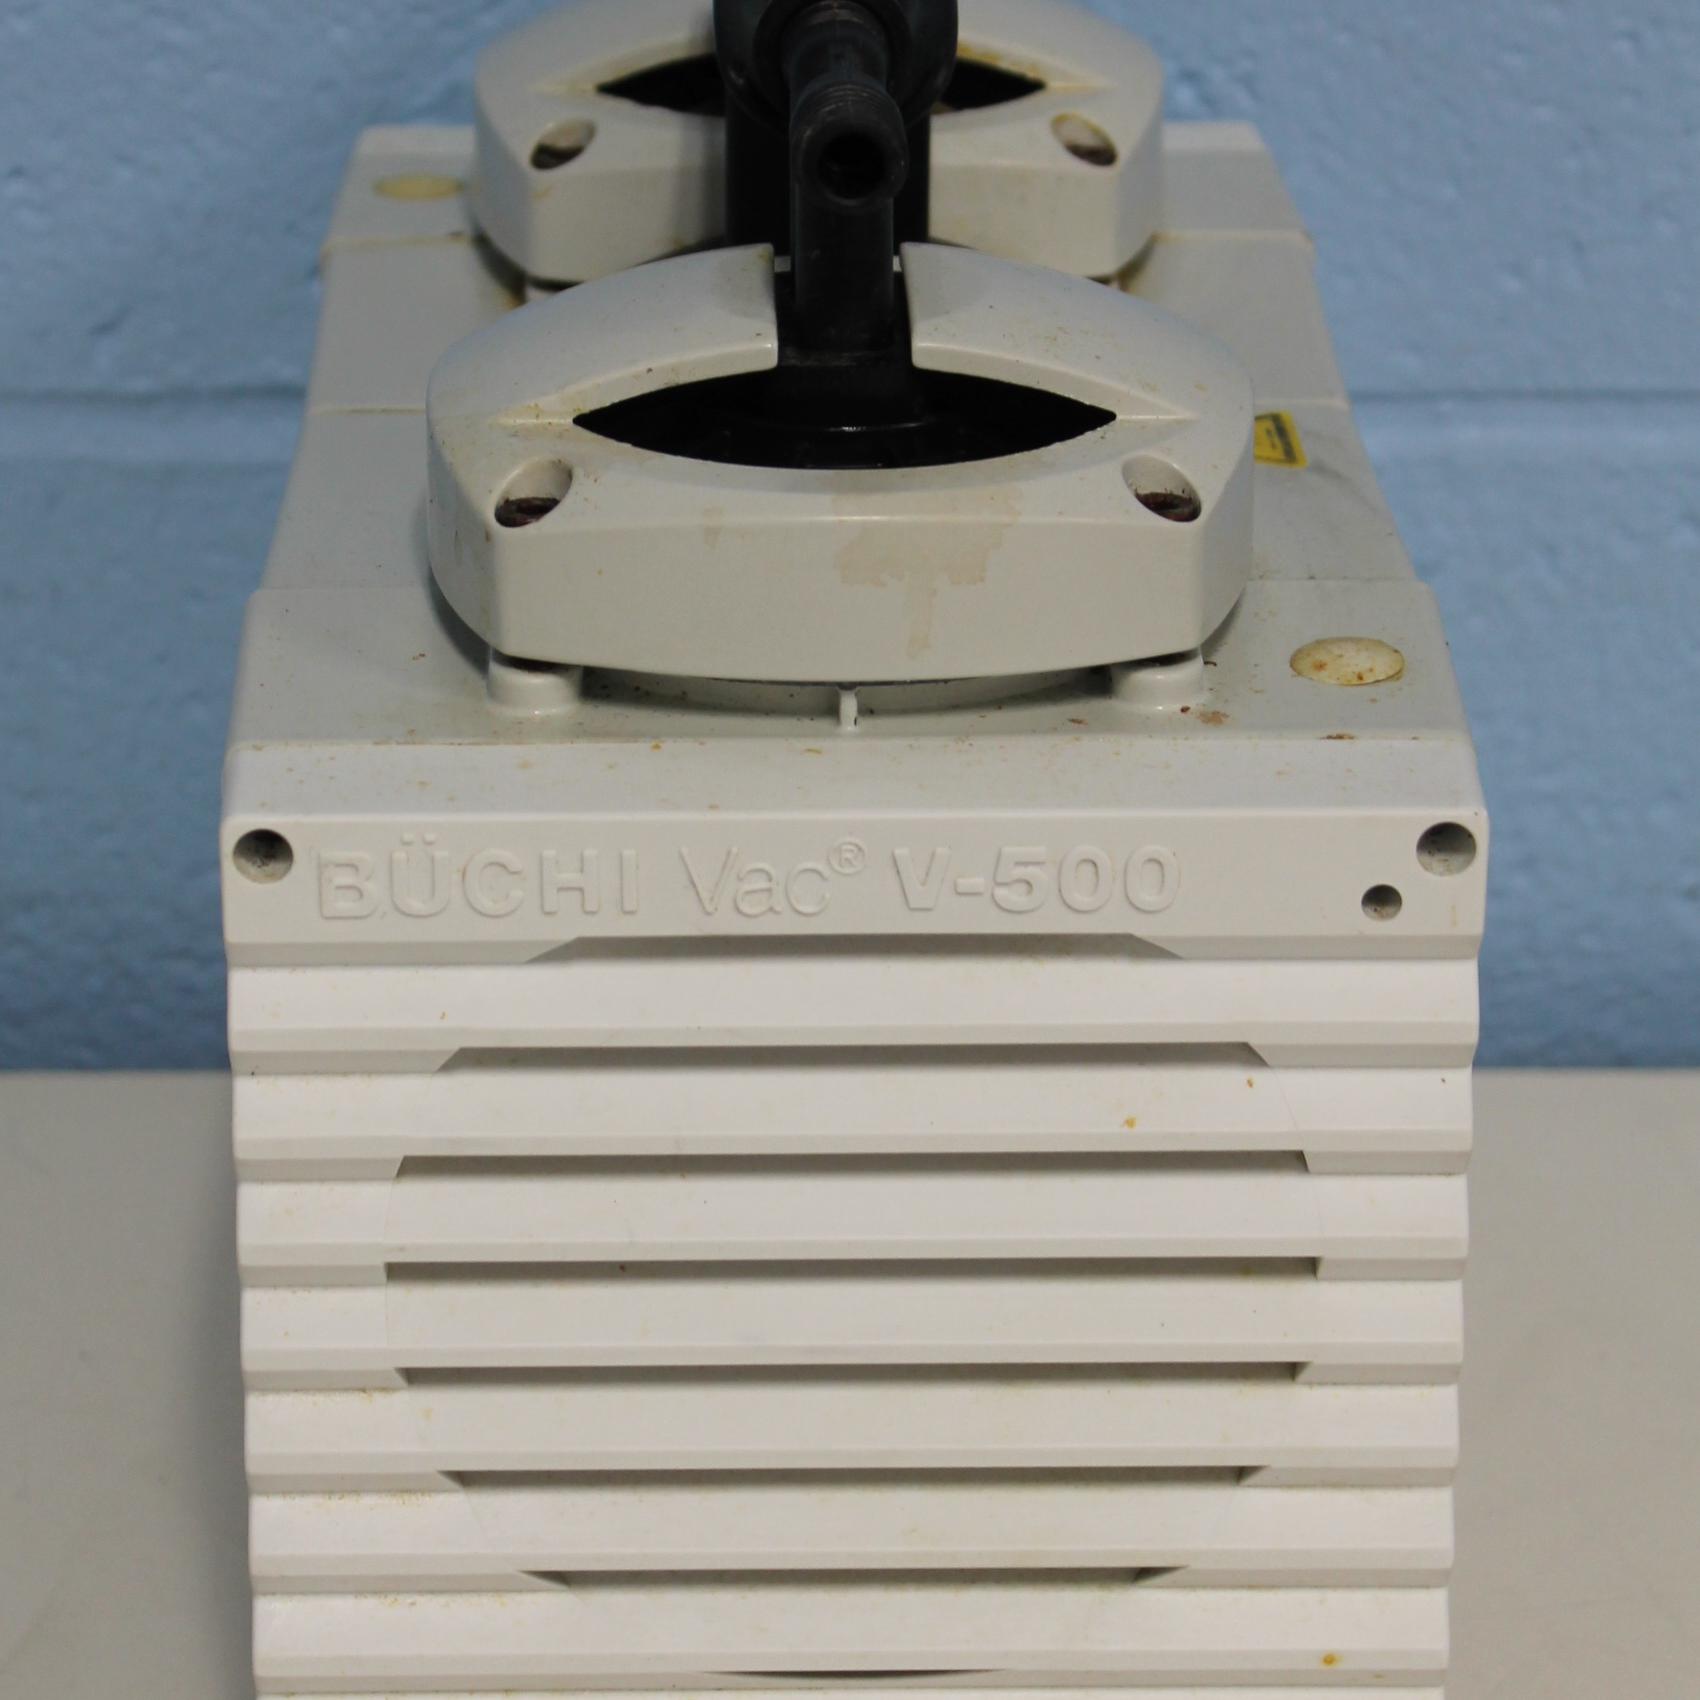 Buchi V-500 Vacuum Pump Image